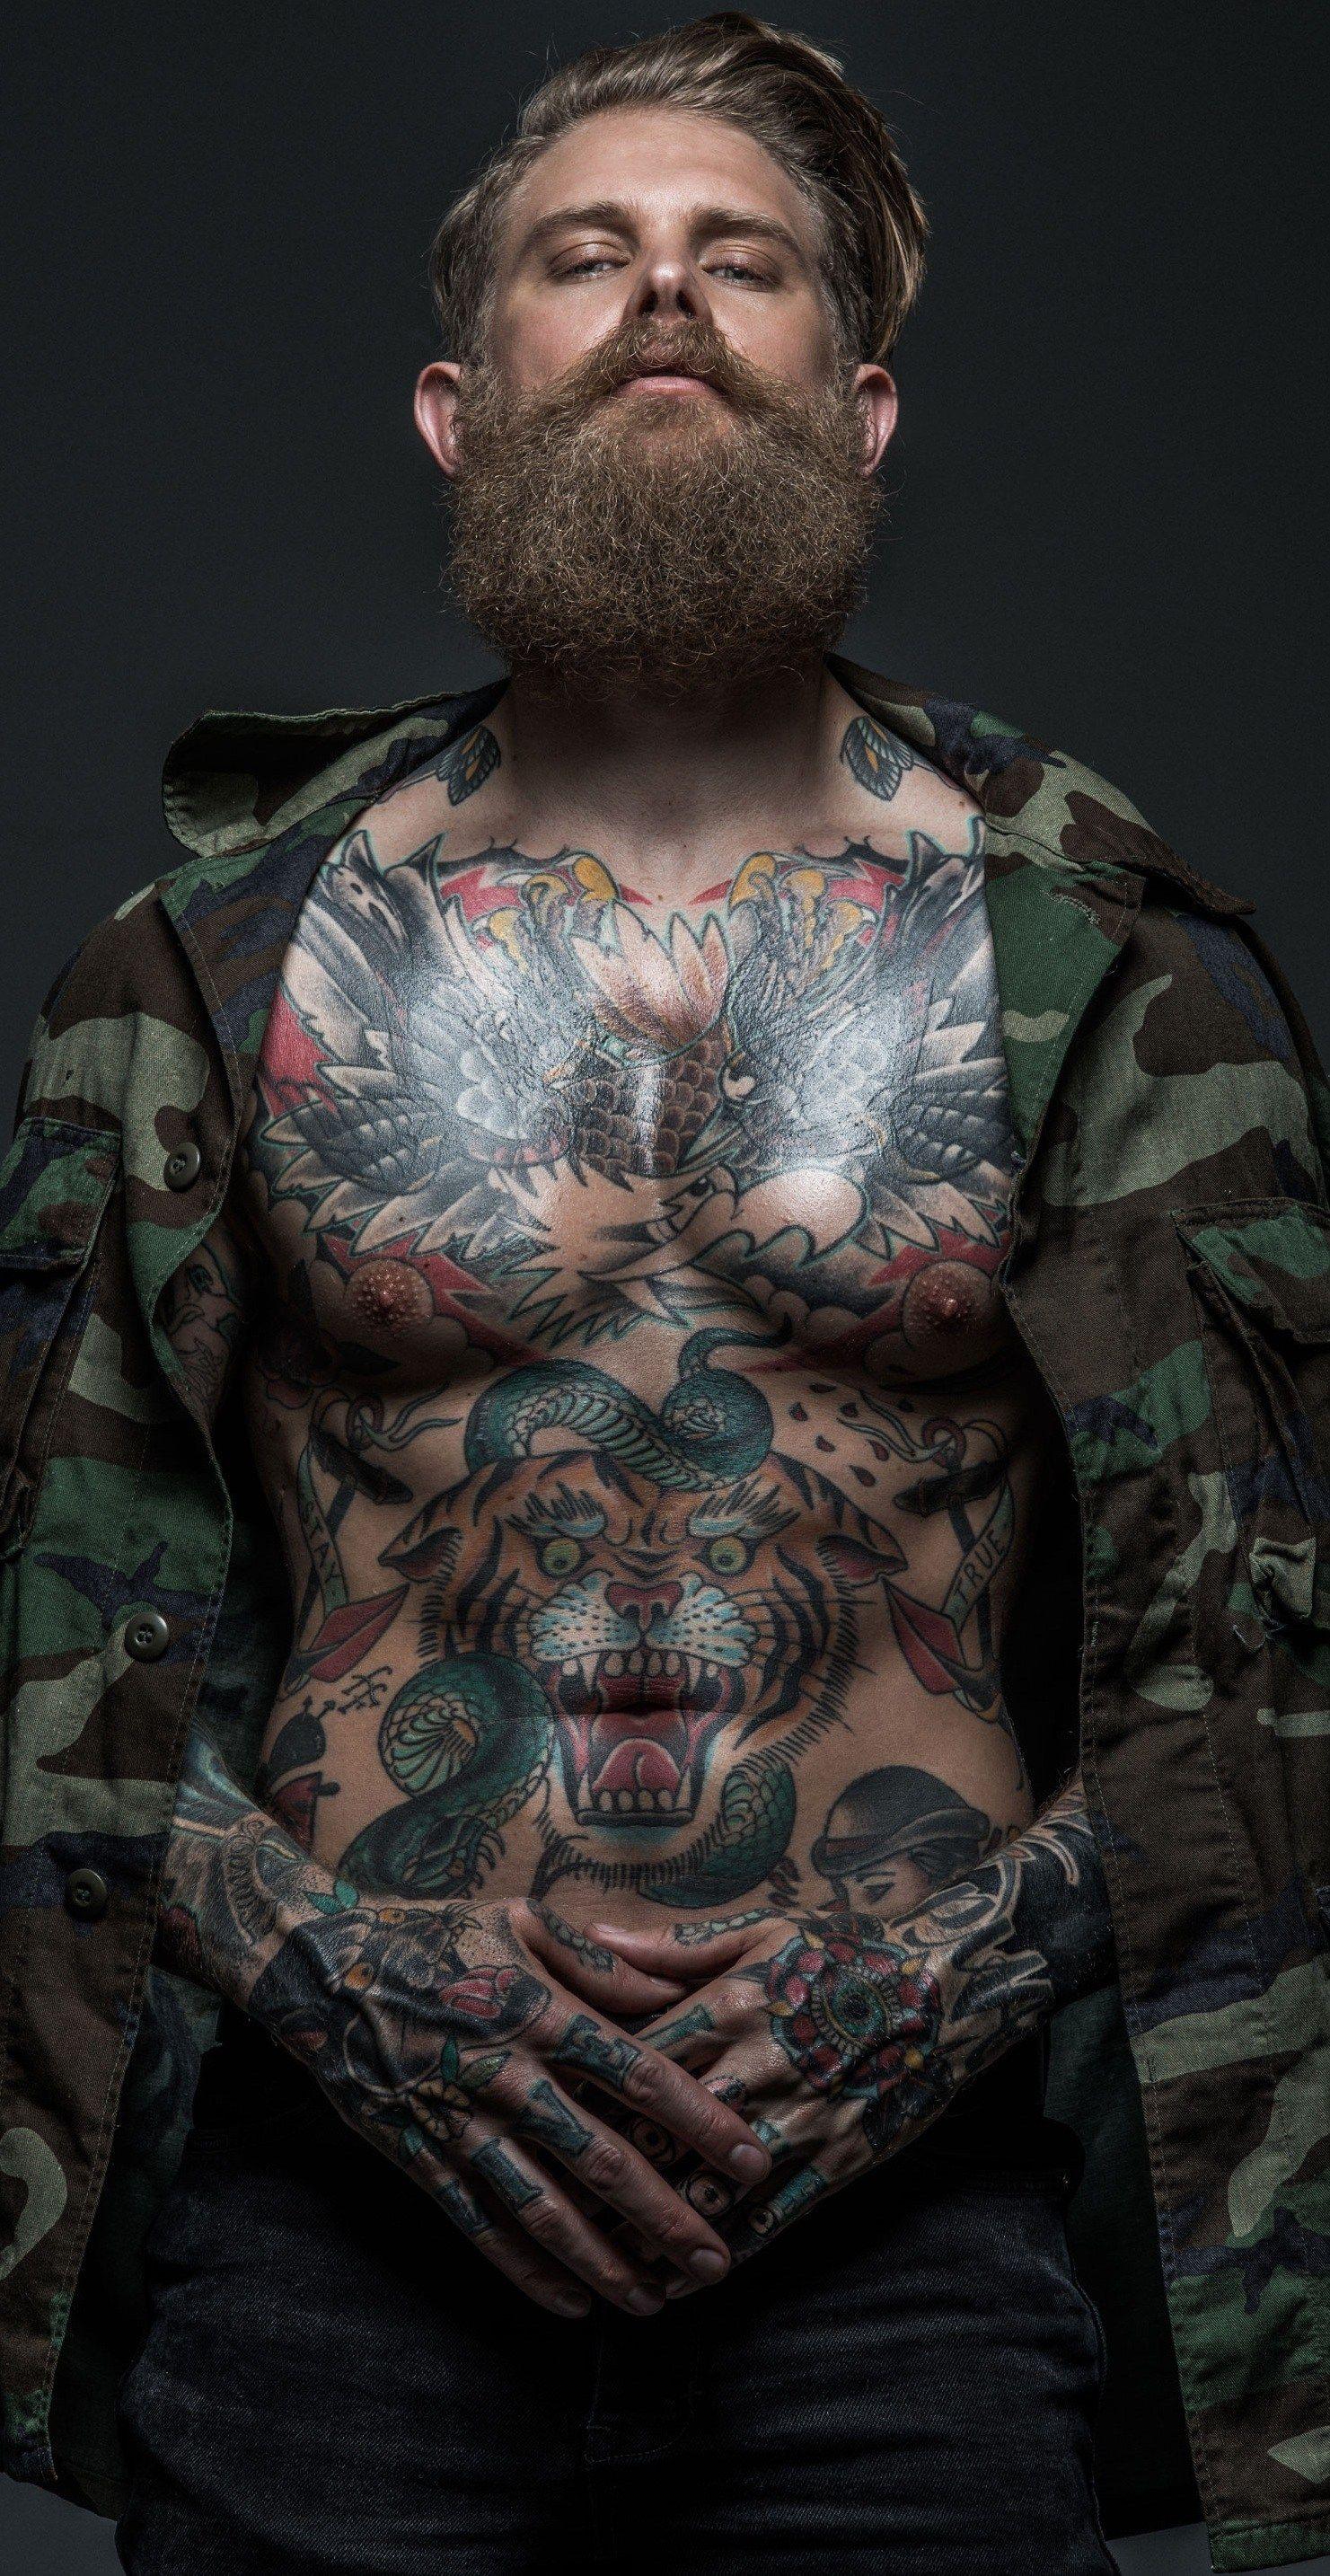 Josh Mario John Tattoo Josh Mario John Fantasy Tattoos Badass Tattoos